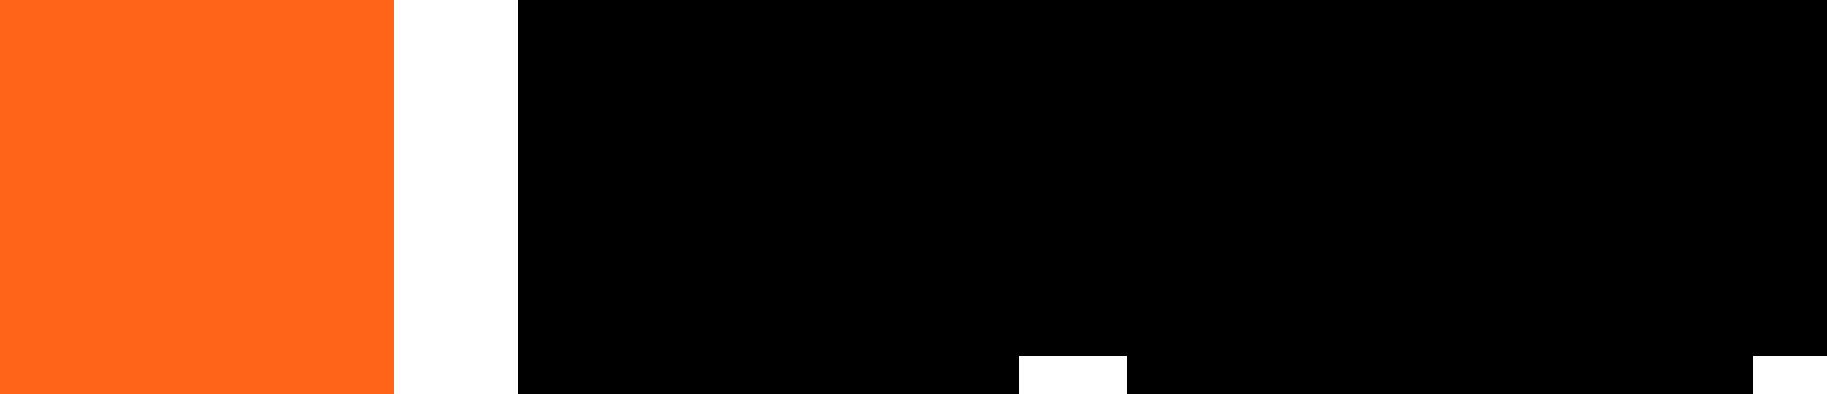 bkw_logo